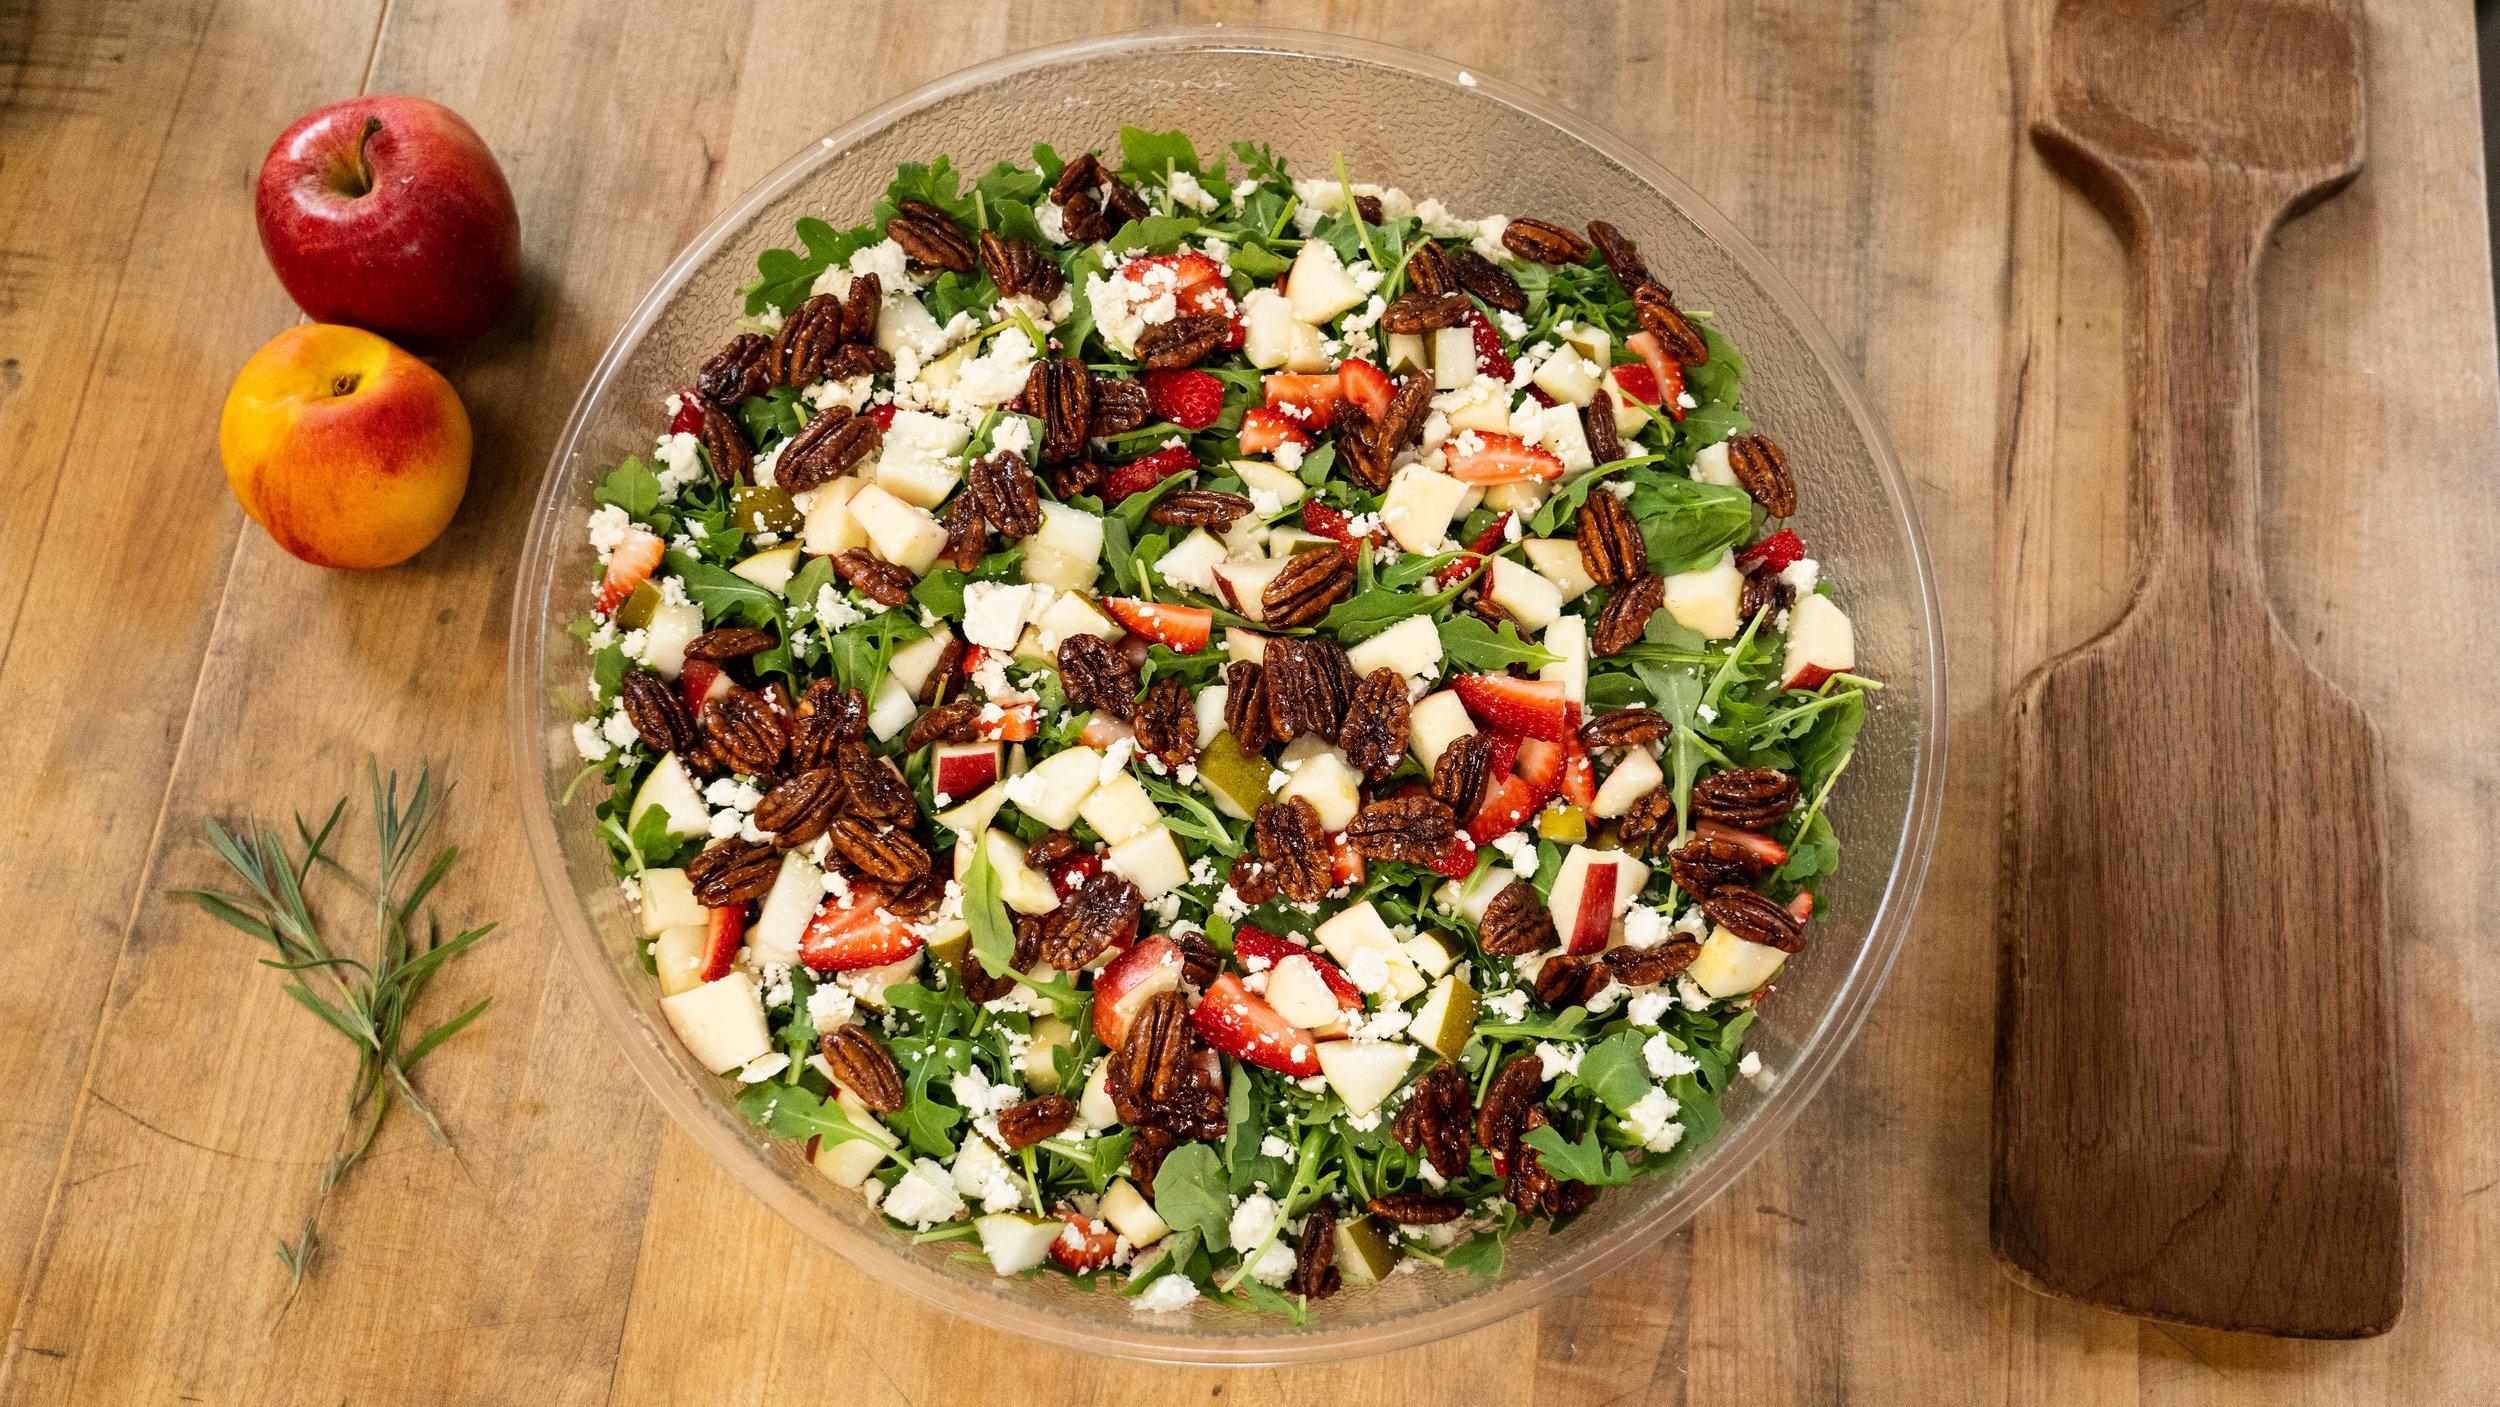 Try our Wild Arugula Salad! Ingredients: organic wild arugula, seasonal fruit, dates, feta cheese, cinammon pecans, housemade balsamic dressing